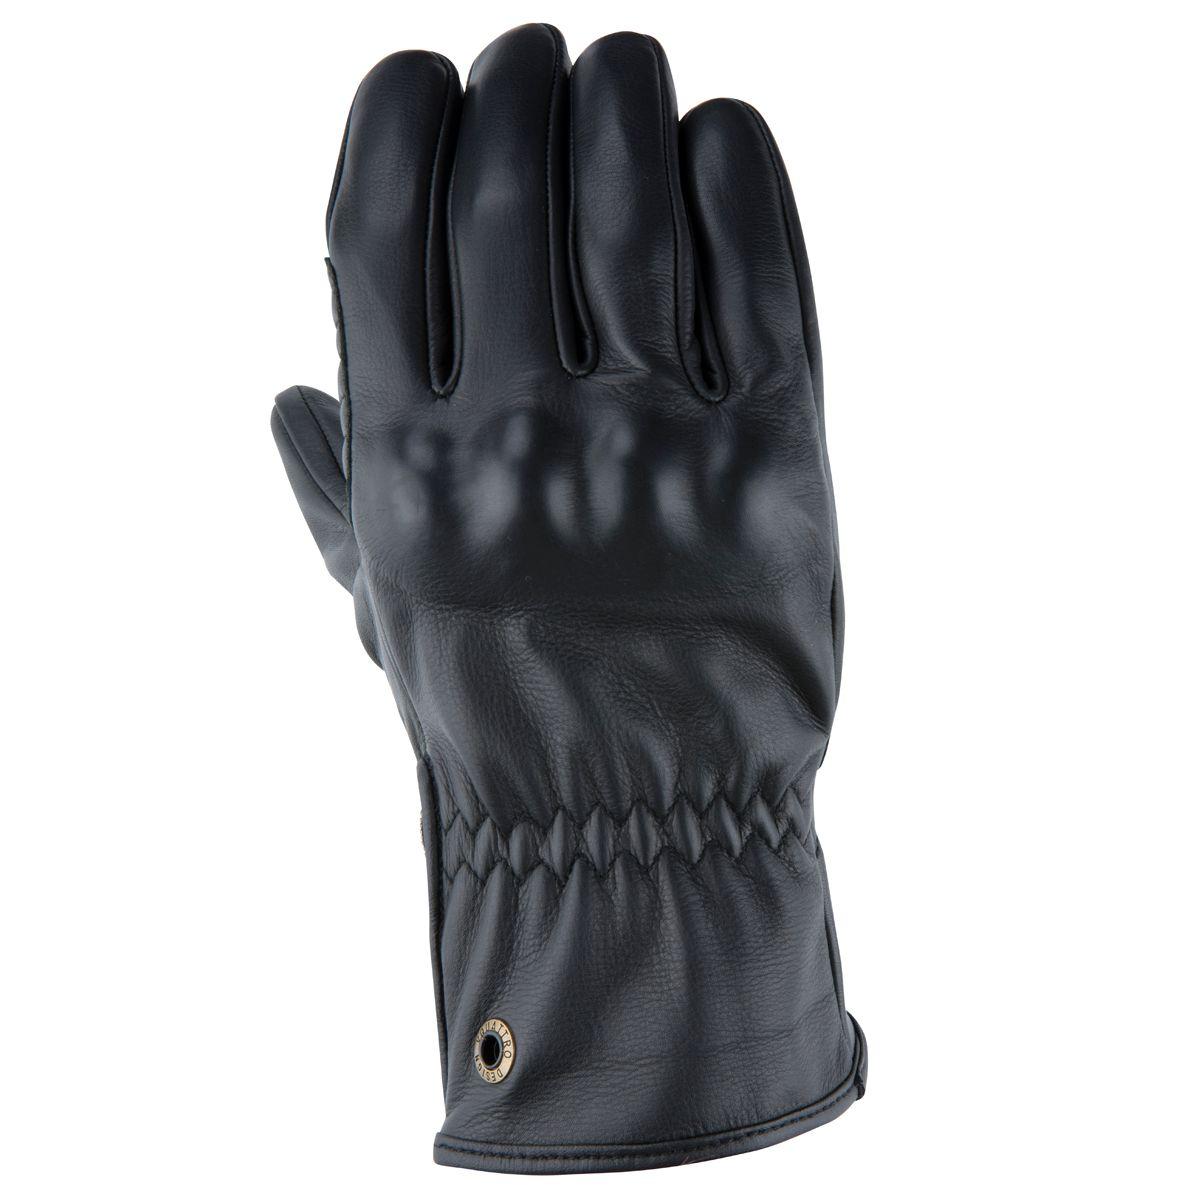 gants v quattro dust gants moto. Black Bedroom Furniture Sets. Home Design Ideas